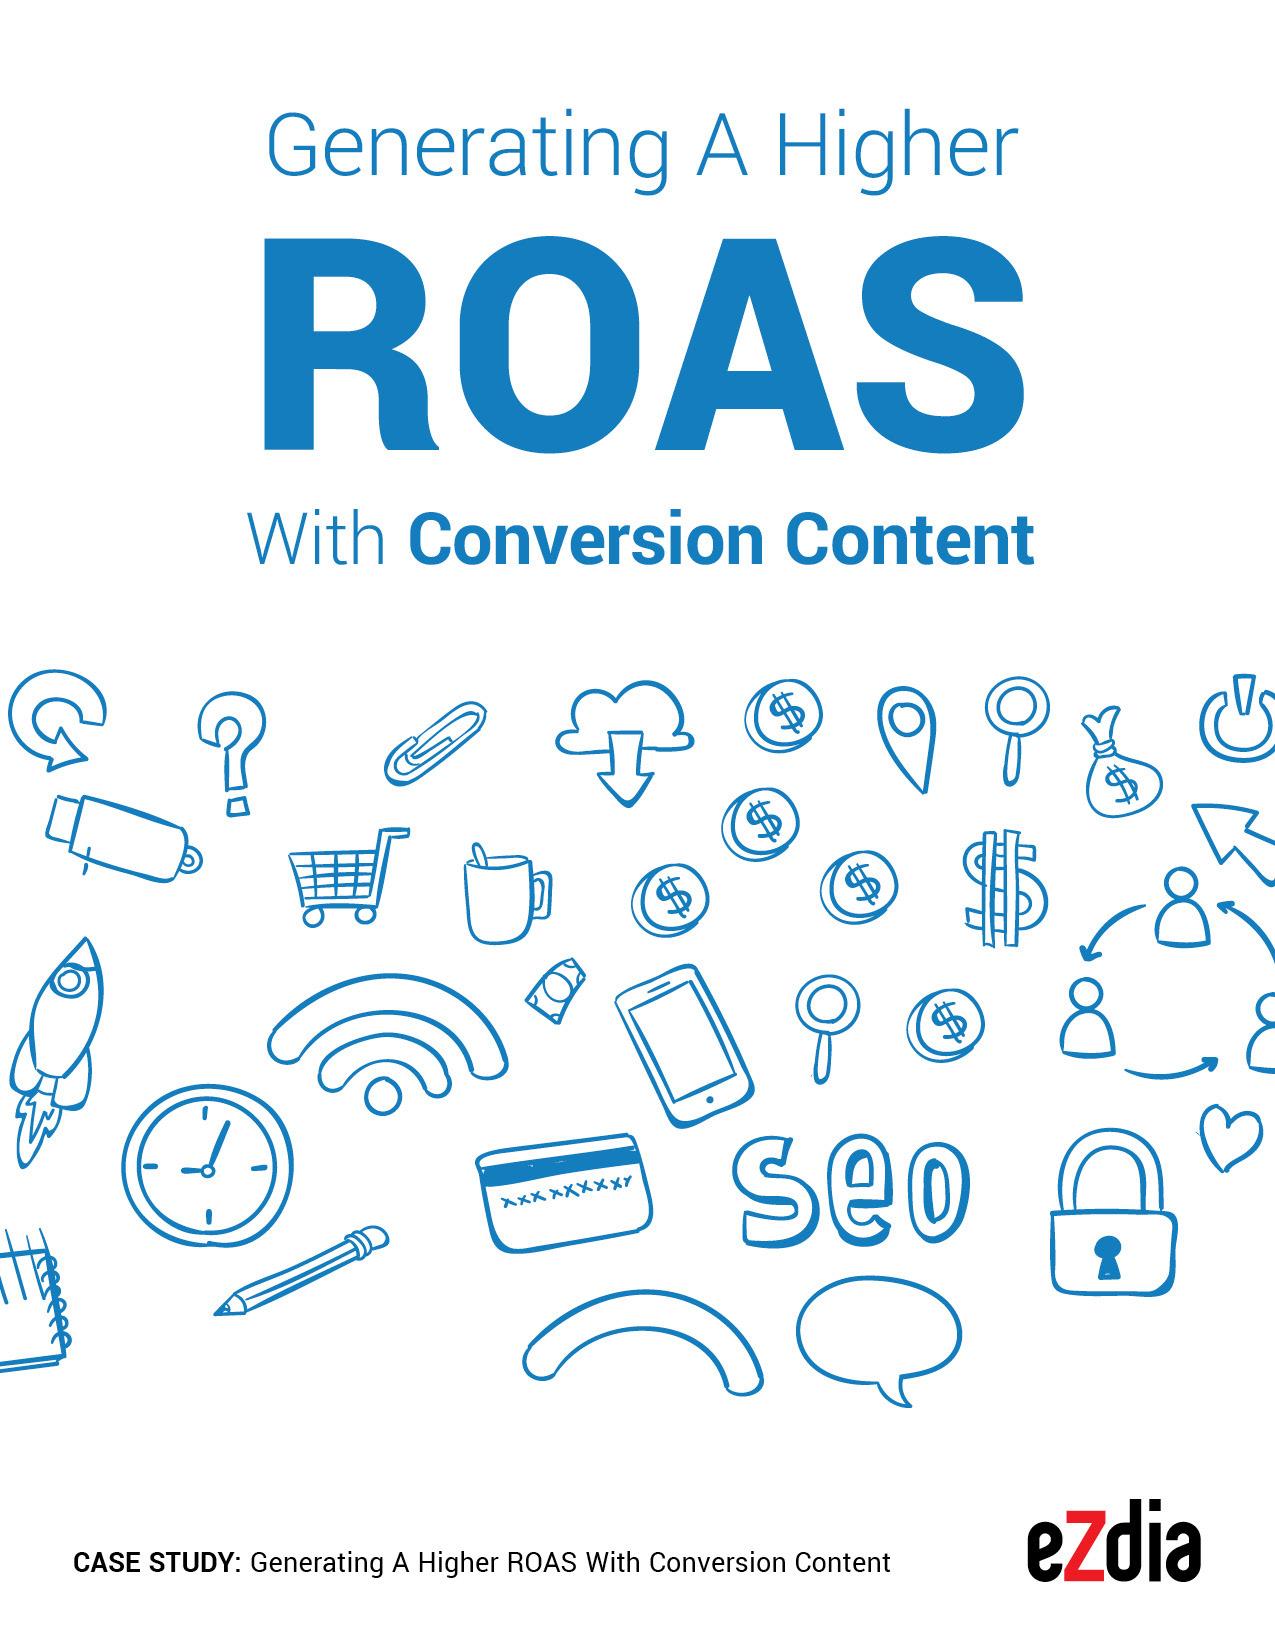 Generating a Higher ROAS